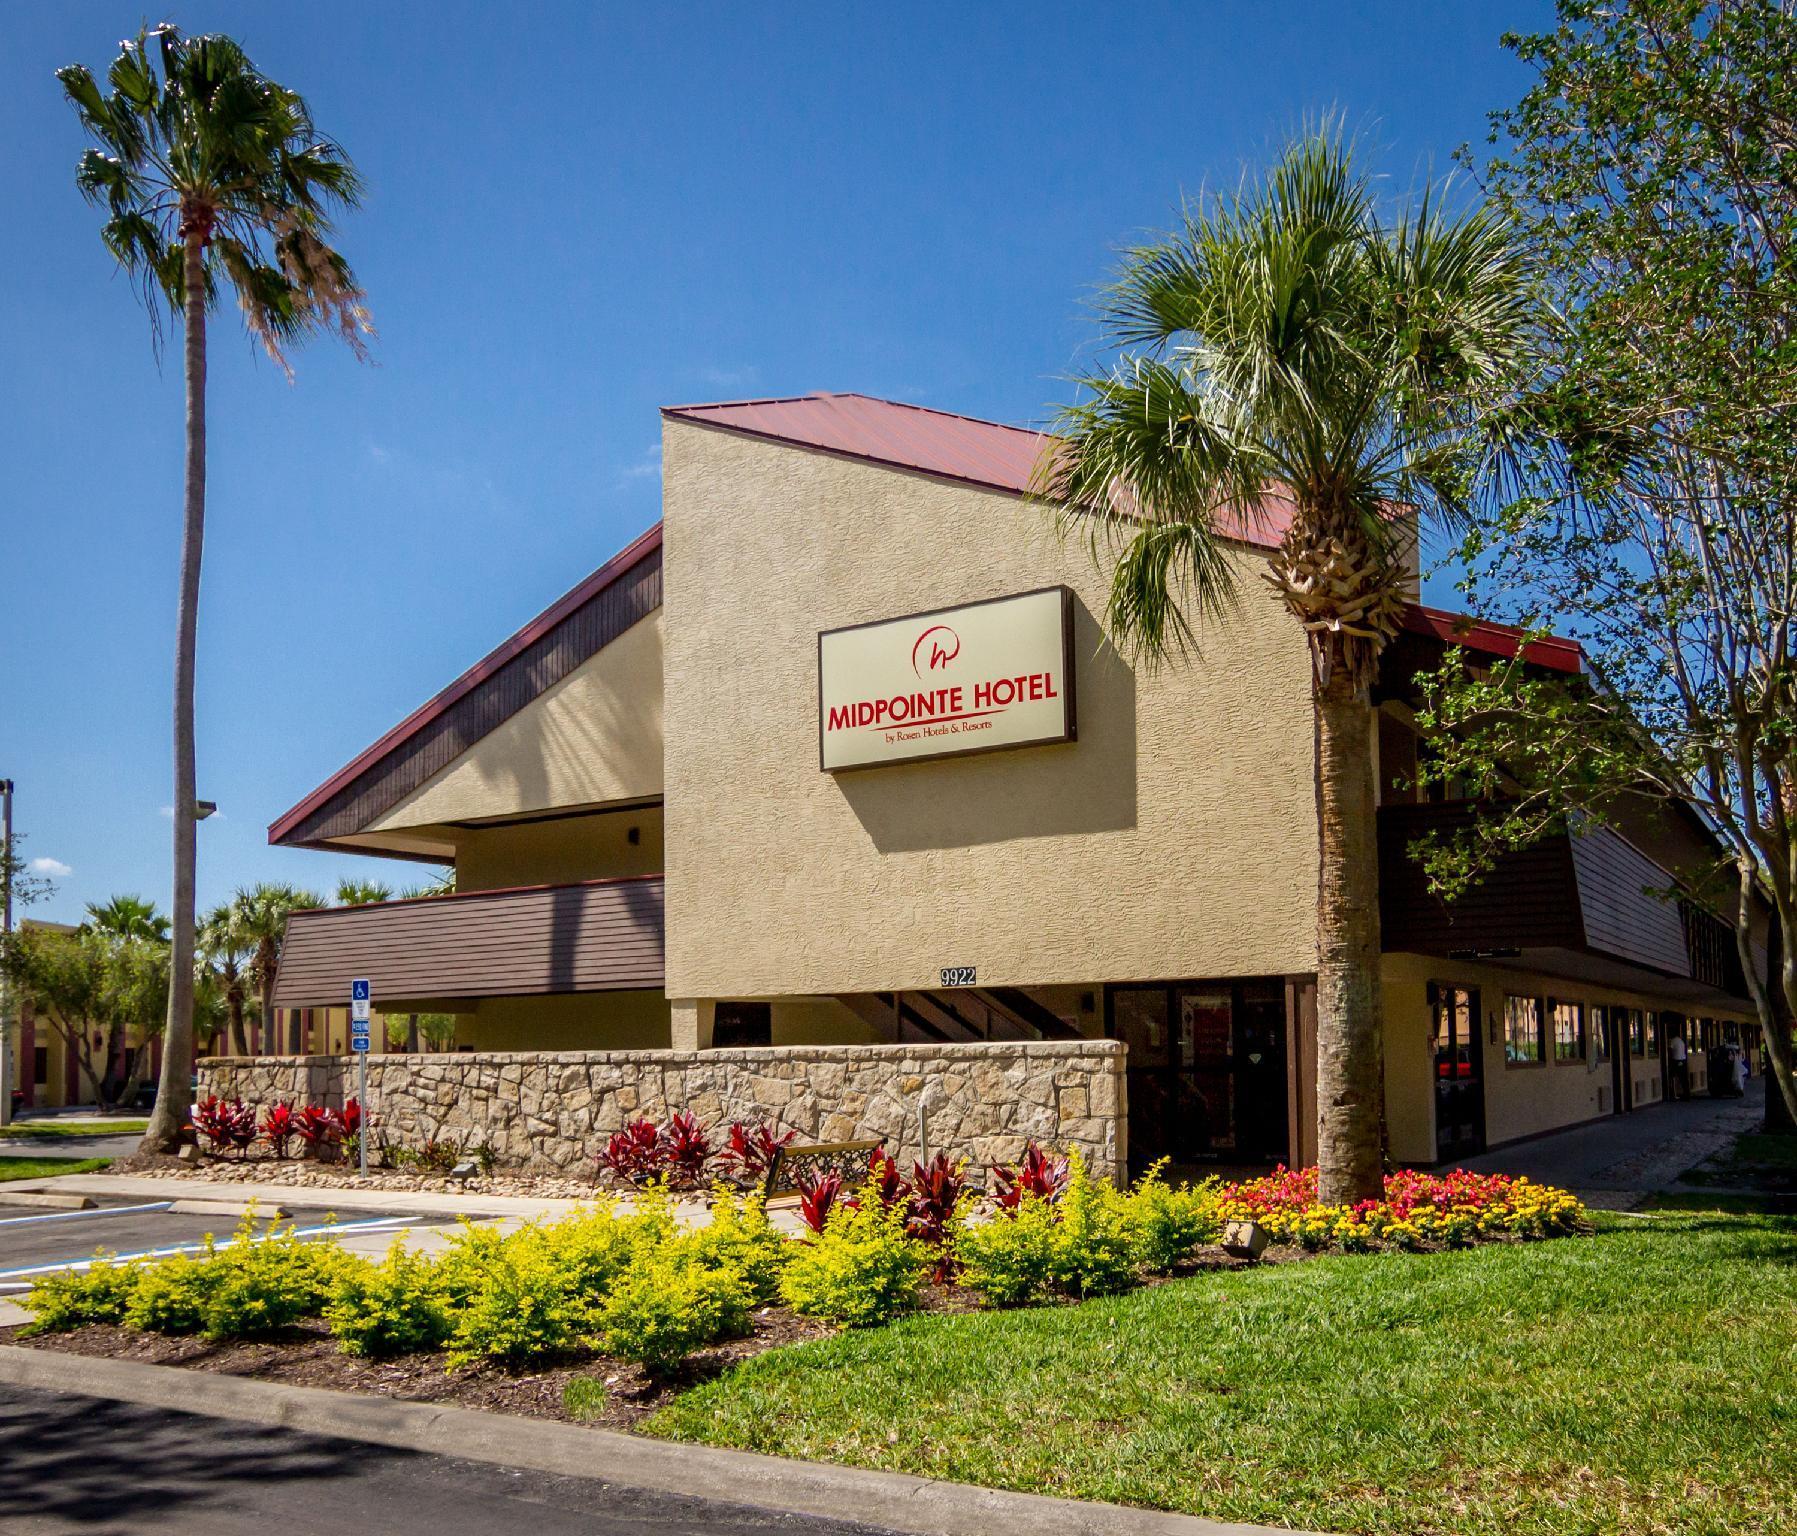 Midpointe Hotel By Rosen Hotels & Resorts